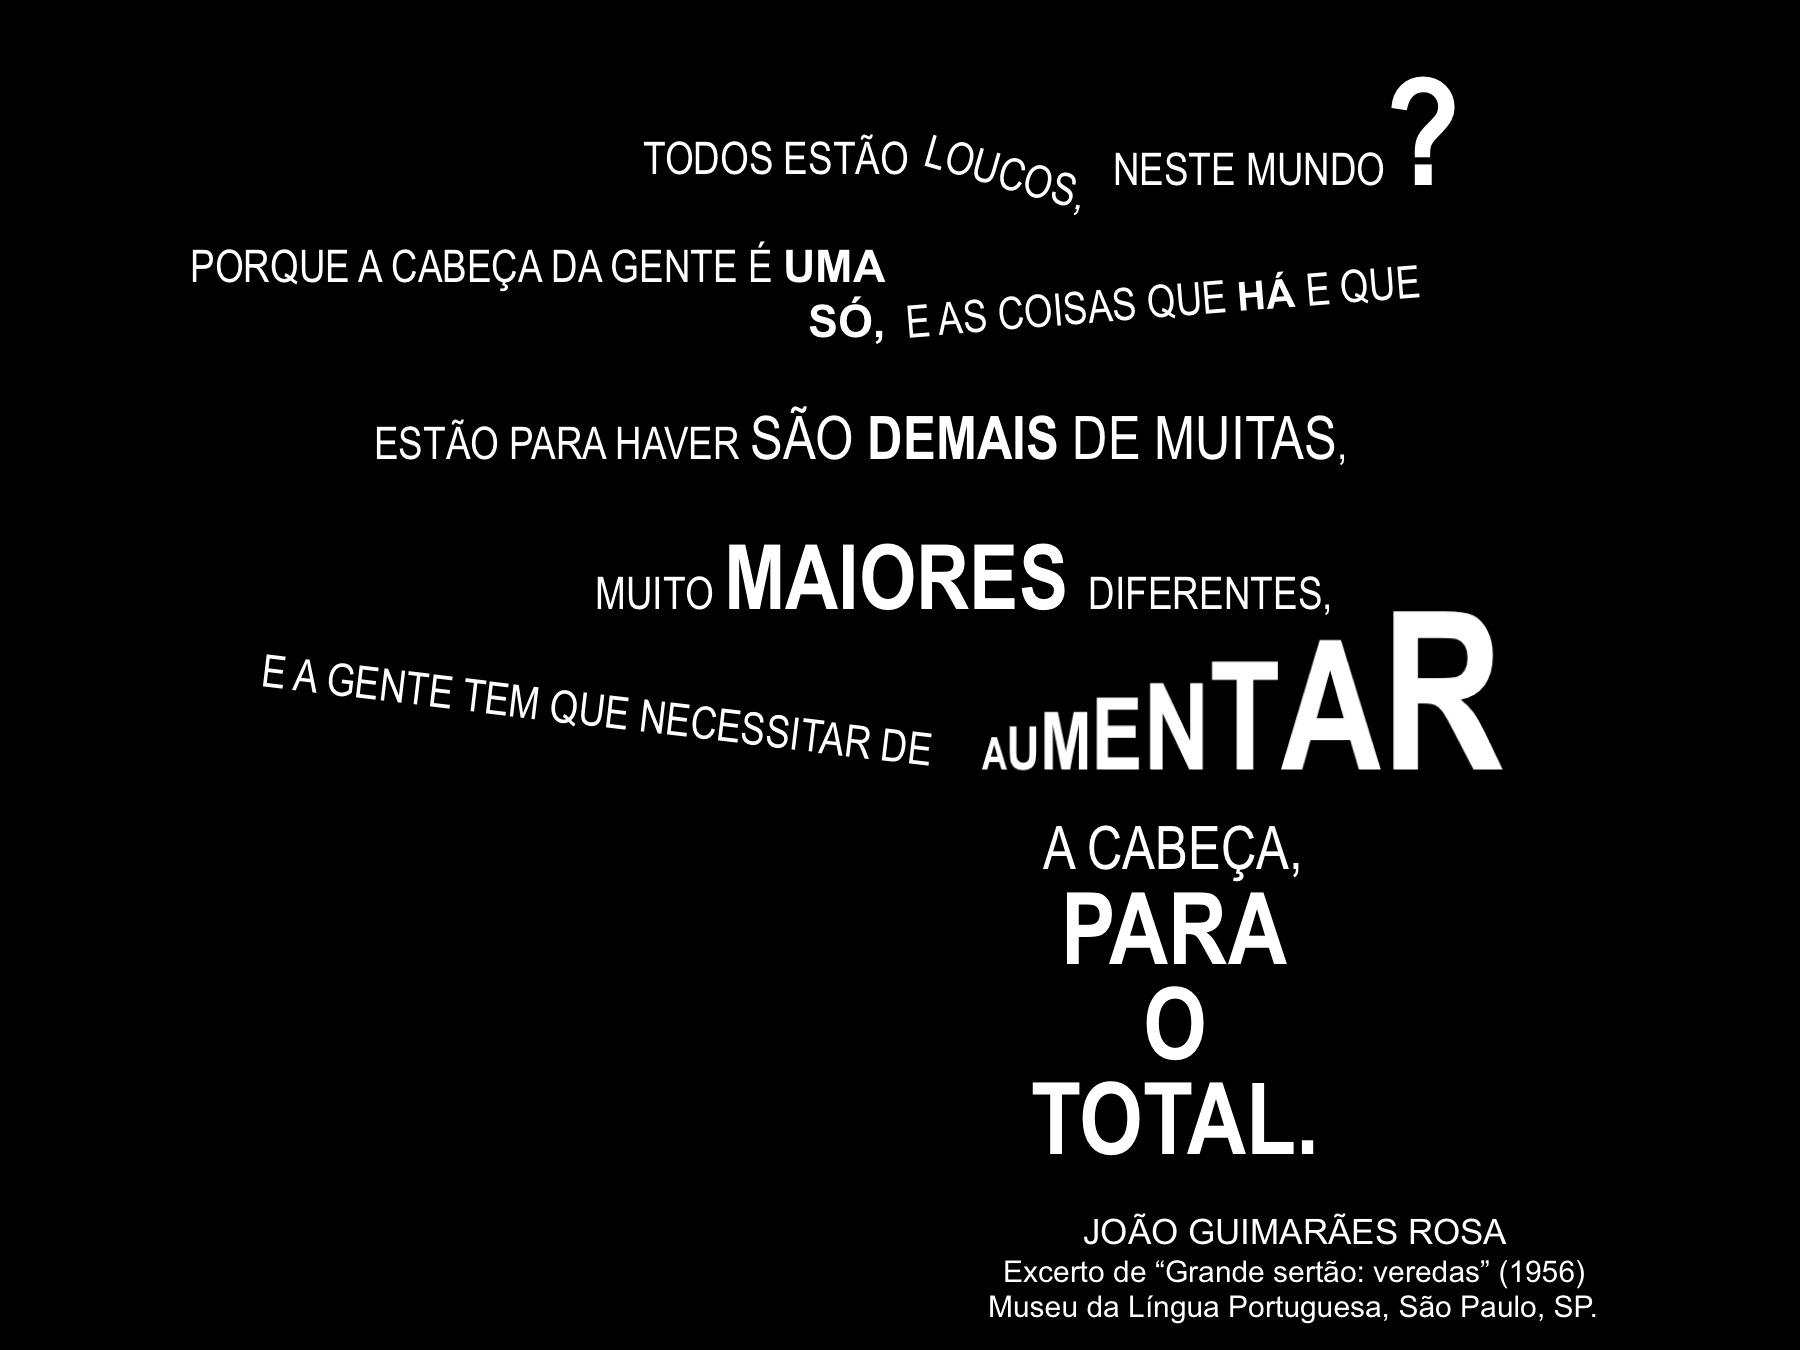 guimaraes_rosa_aumentar_cabeca.jpg